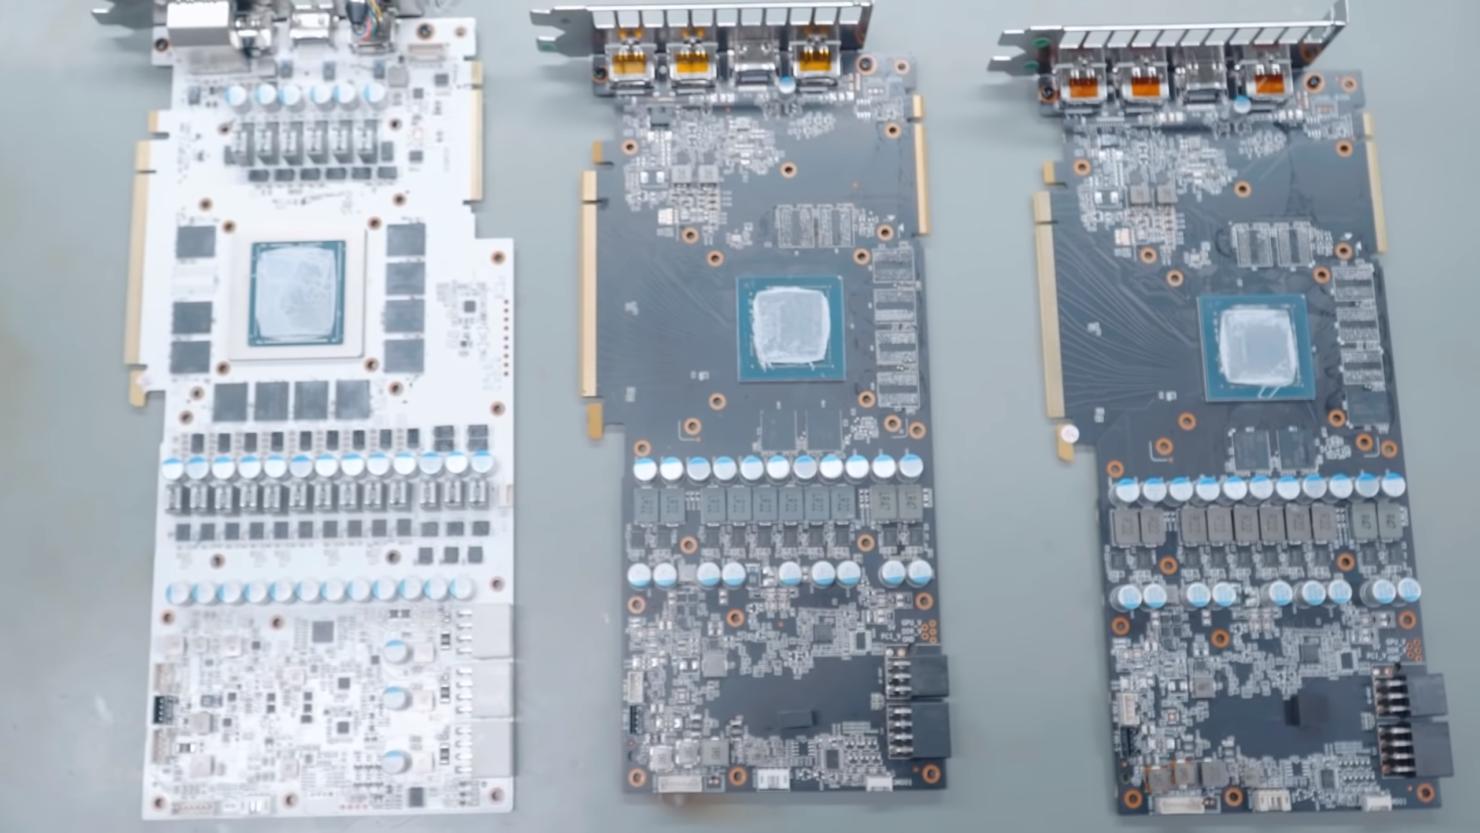 teclab-geforce-rtx-2080-ti-super-unigine-extreme-benchmark-16-gbps-memory_9